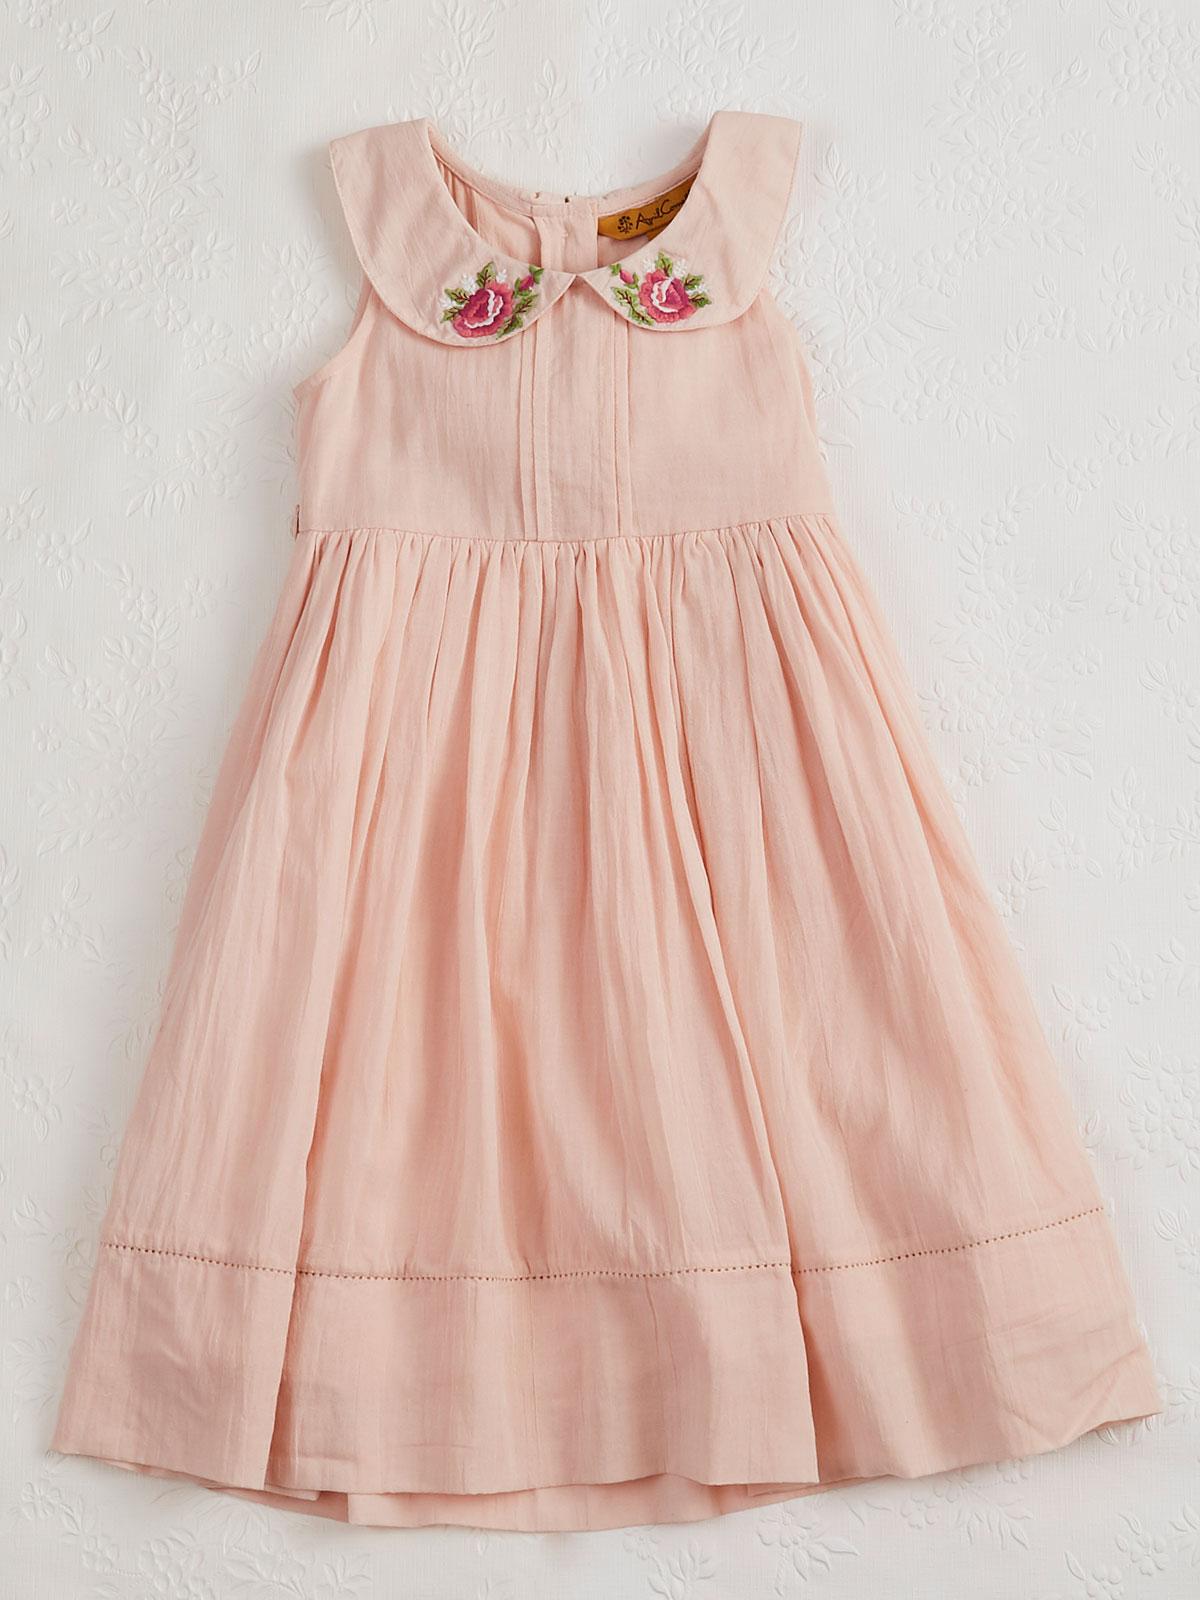 Purity Girls Dress